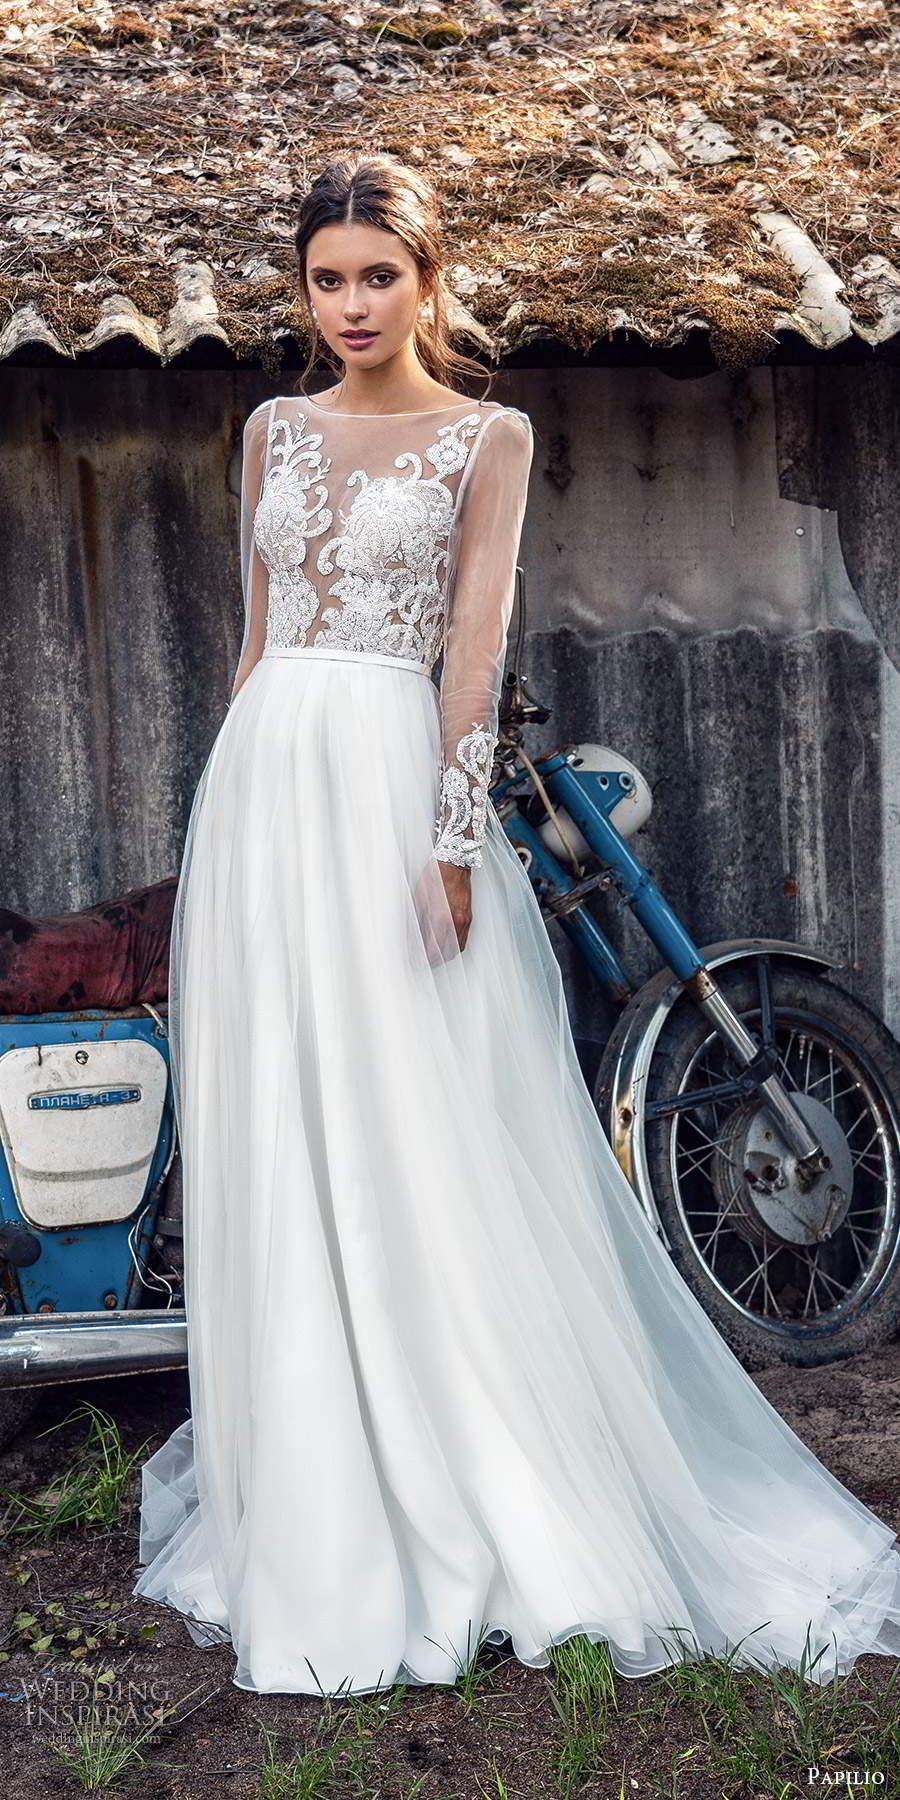 papili 2020 freedom bridal illusion long sleeves sheer bateau neckline a line ball gown wedding dress chapel train (2) mv